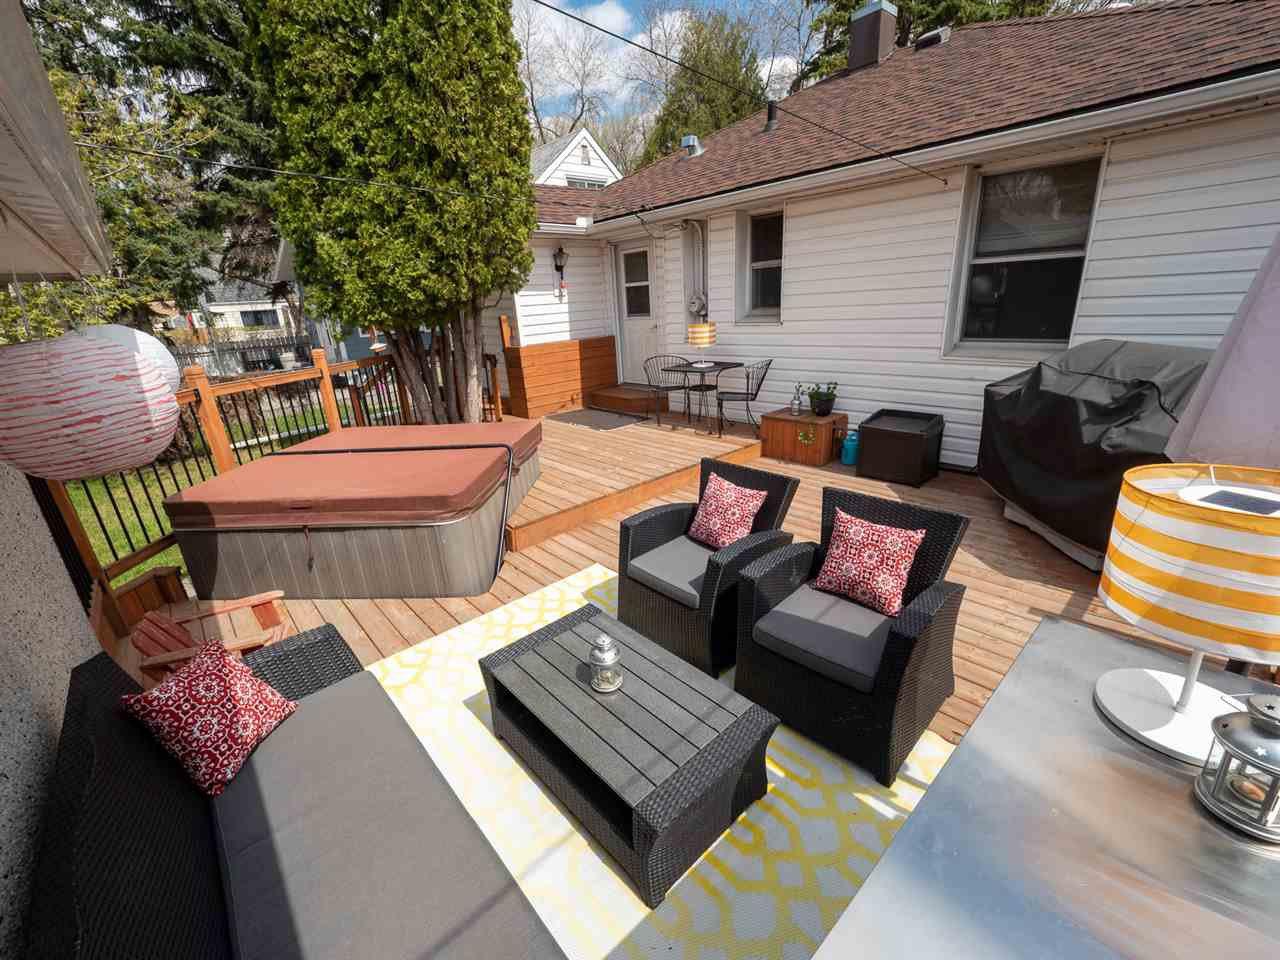 Main Photo: 12086 58 Street in Edmonton: Zone 06 House for sale : MLS®# E4201475